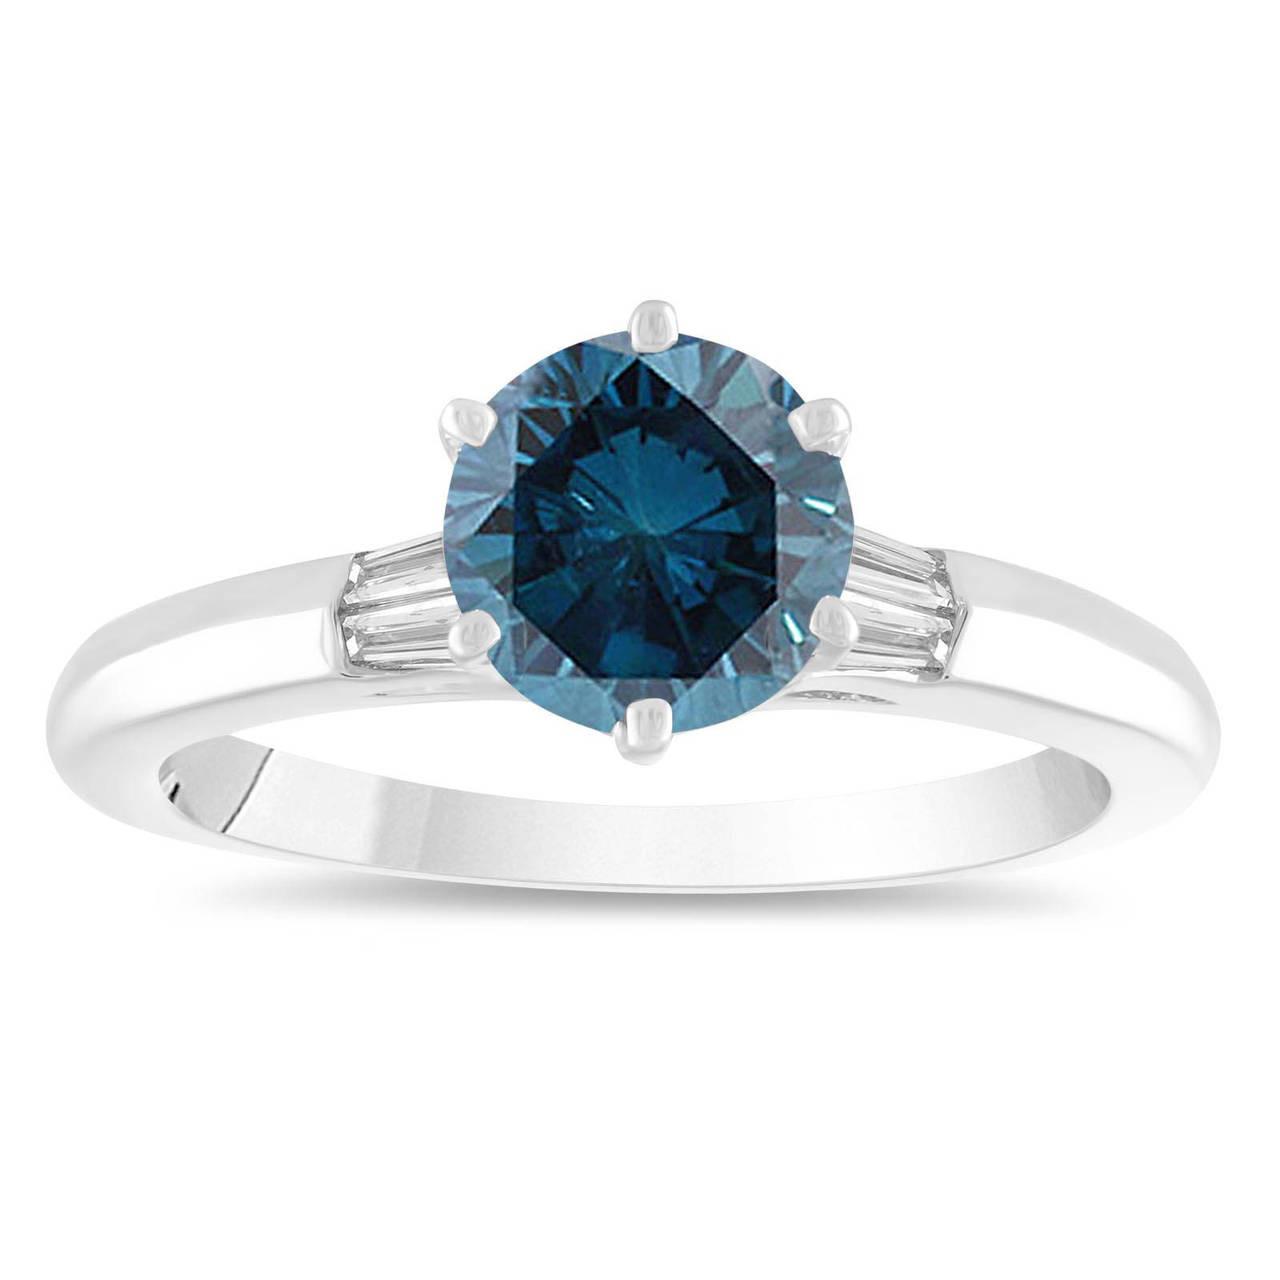 1 25 Carat Blue Diamond Engagement Ring Classic Fancy Wedding Ring